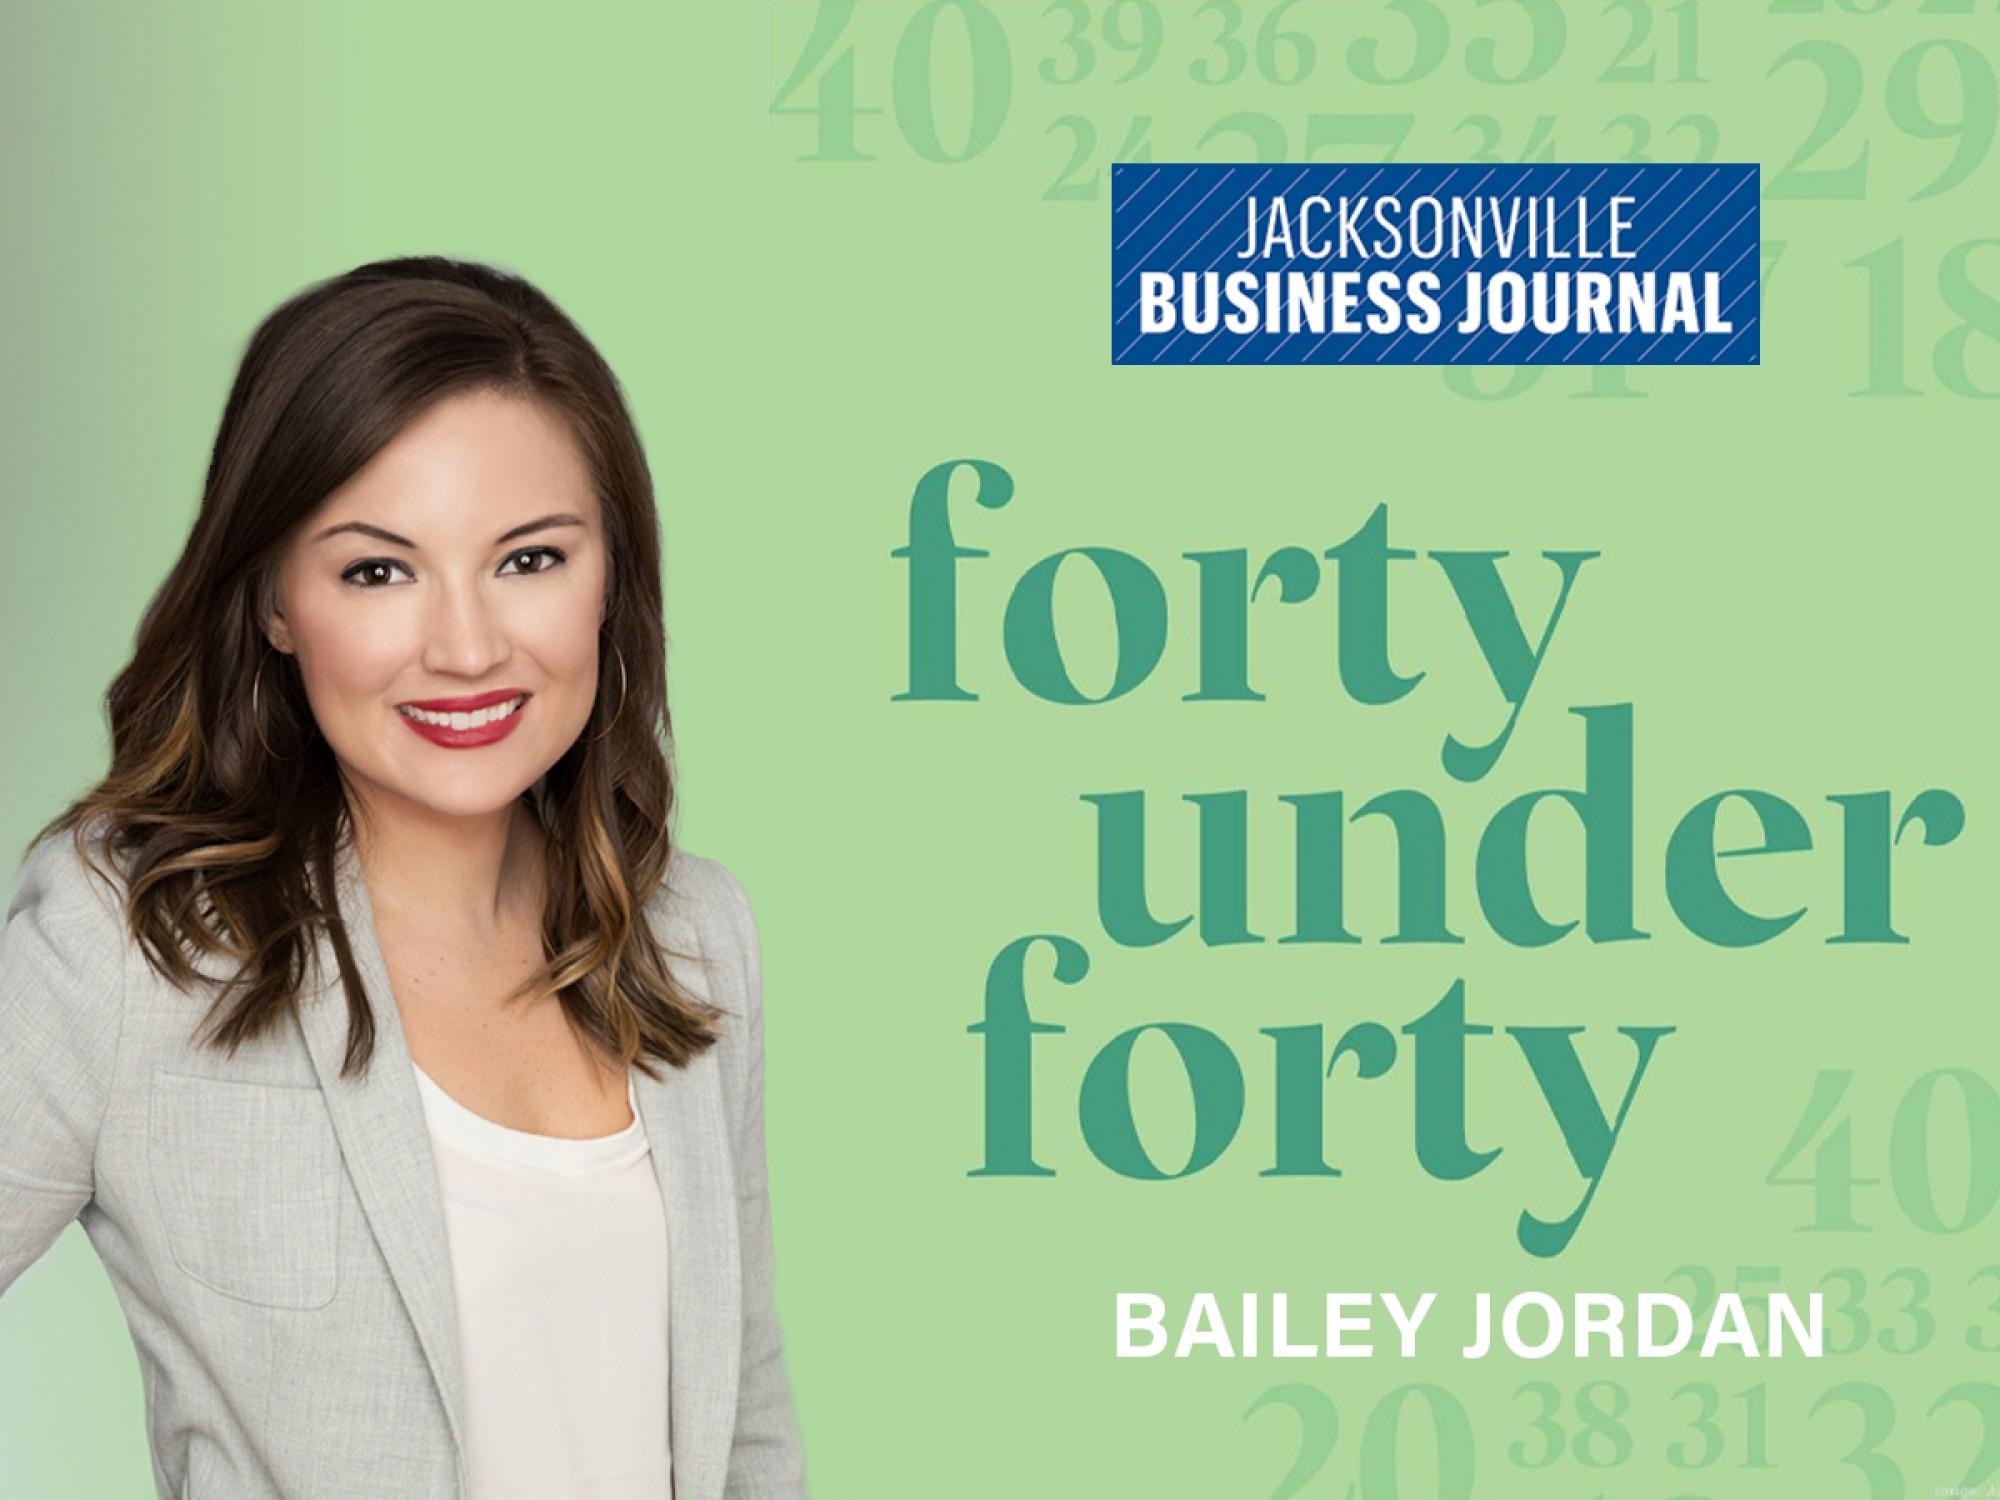 Bailey Jordan inducted into JBJ's 40 Under 40 class of 2021